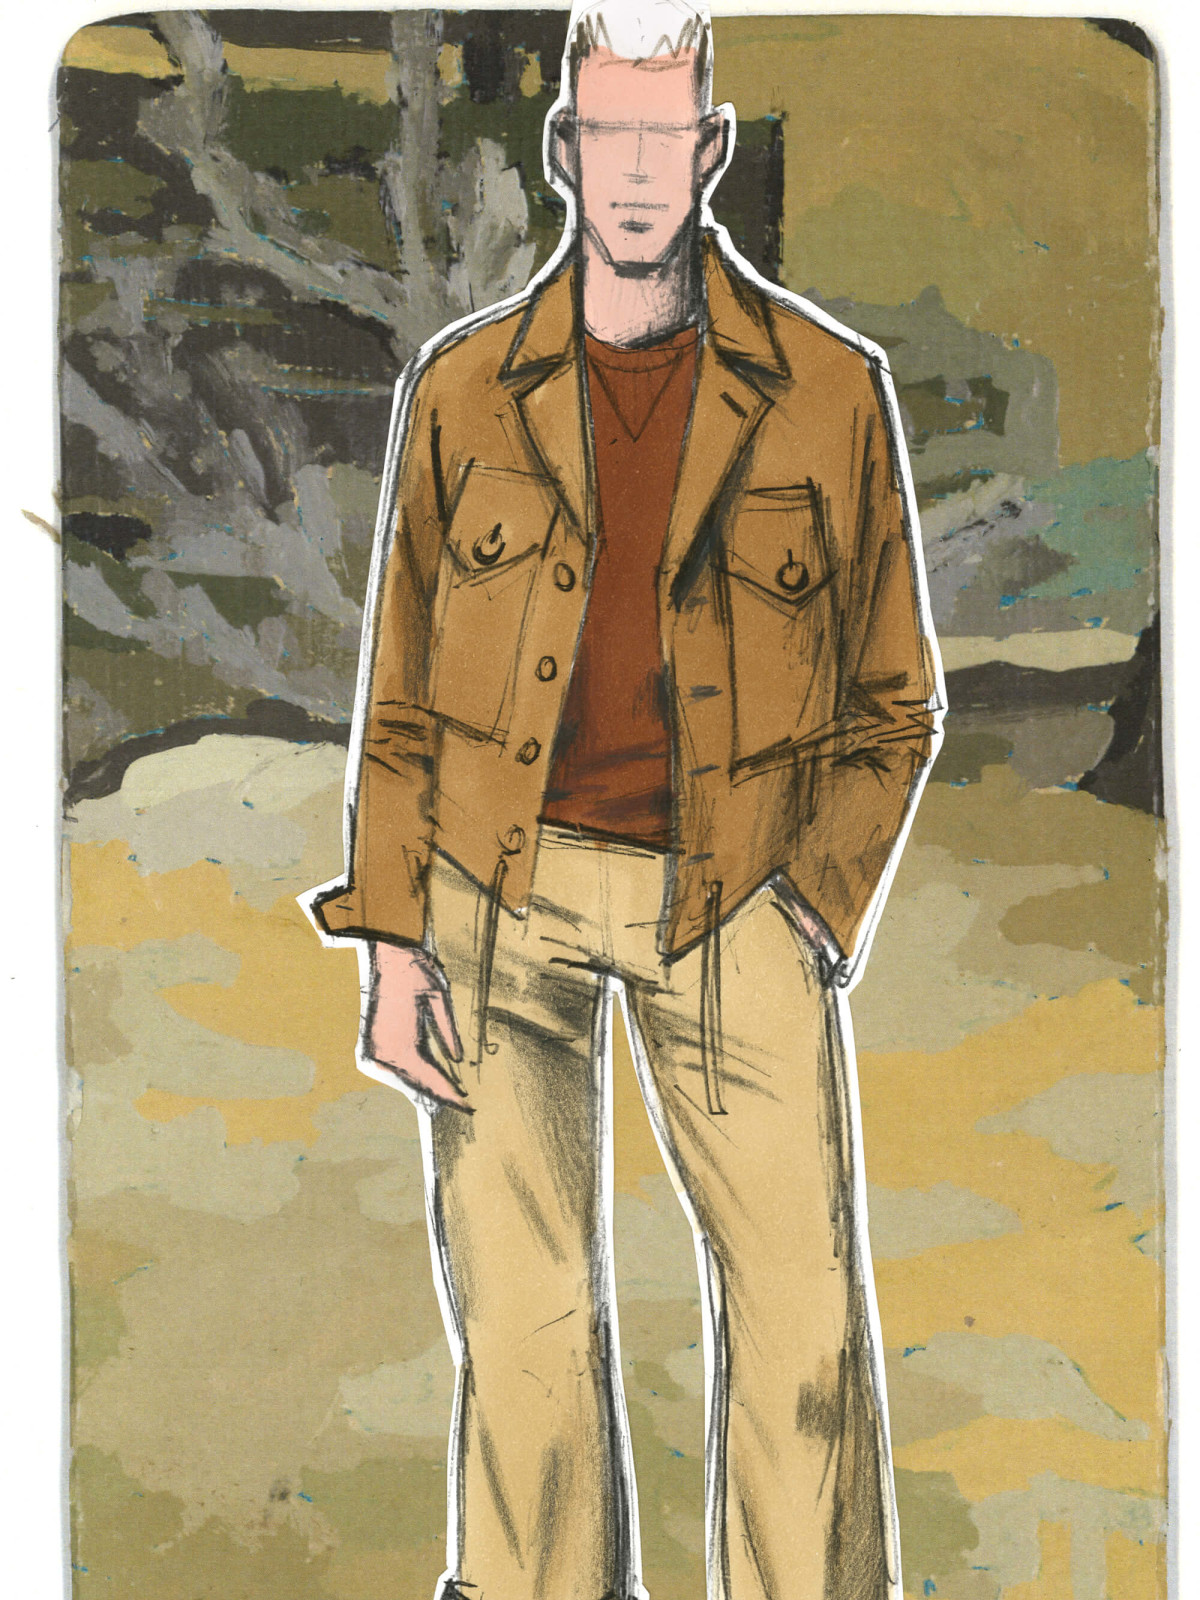 J Crew menswear designer inspiration sketch Frank Muytjens